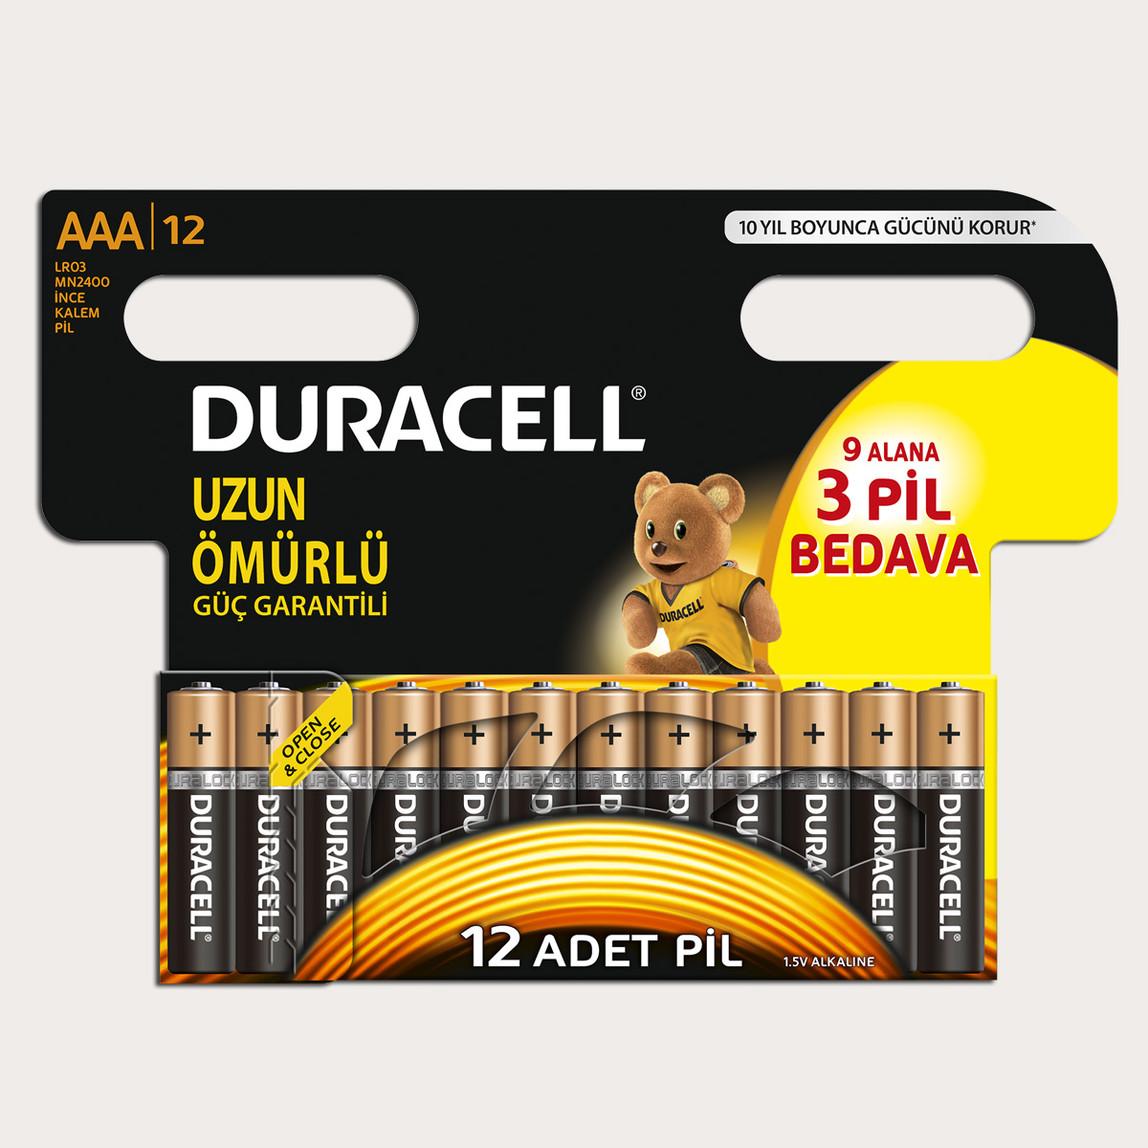 Duracell Basic İnce Kalem Pil 12'li AAA